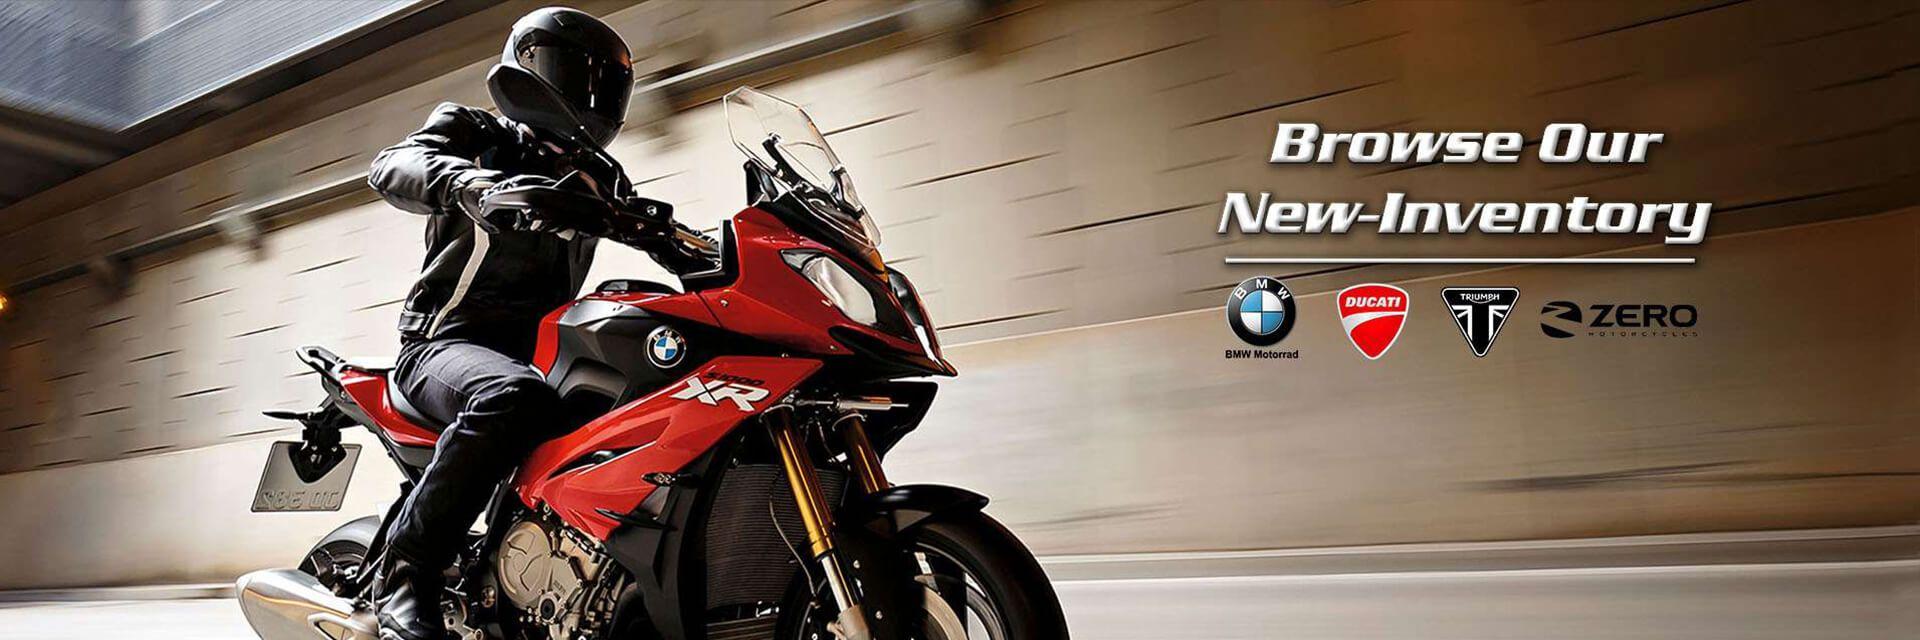 Touring Sport Bmw Ducati Triumph Zero Motorcycle Dealers In Sc